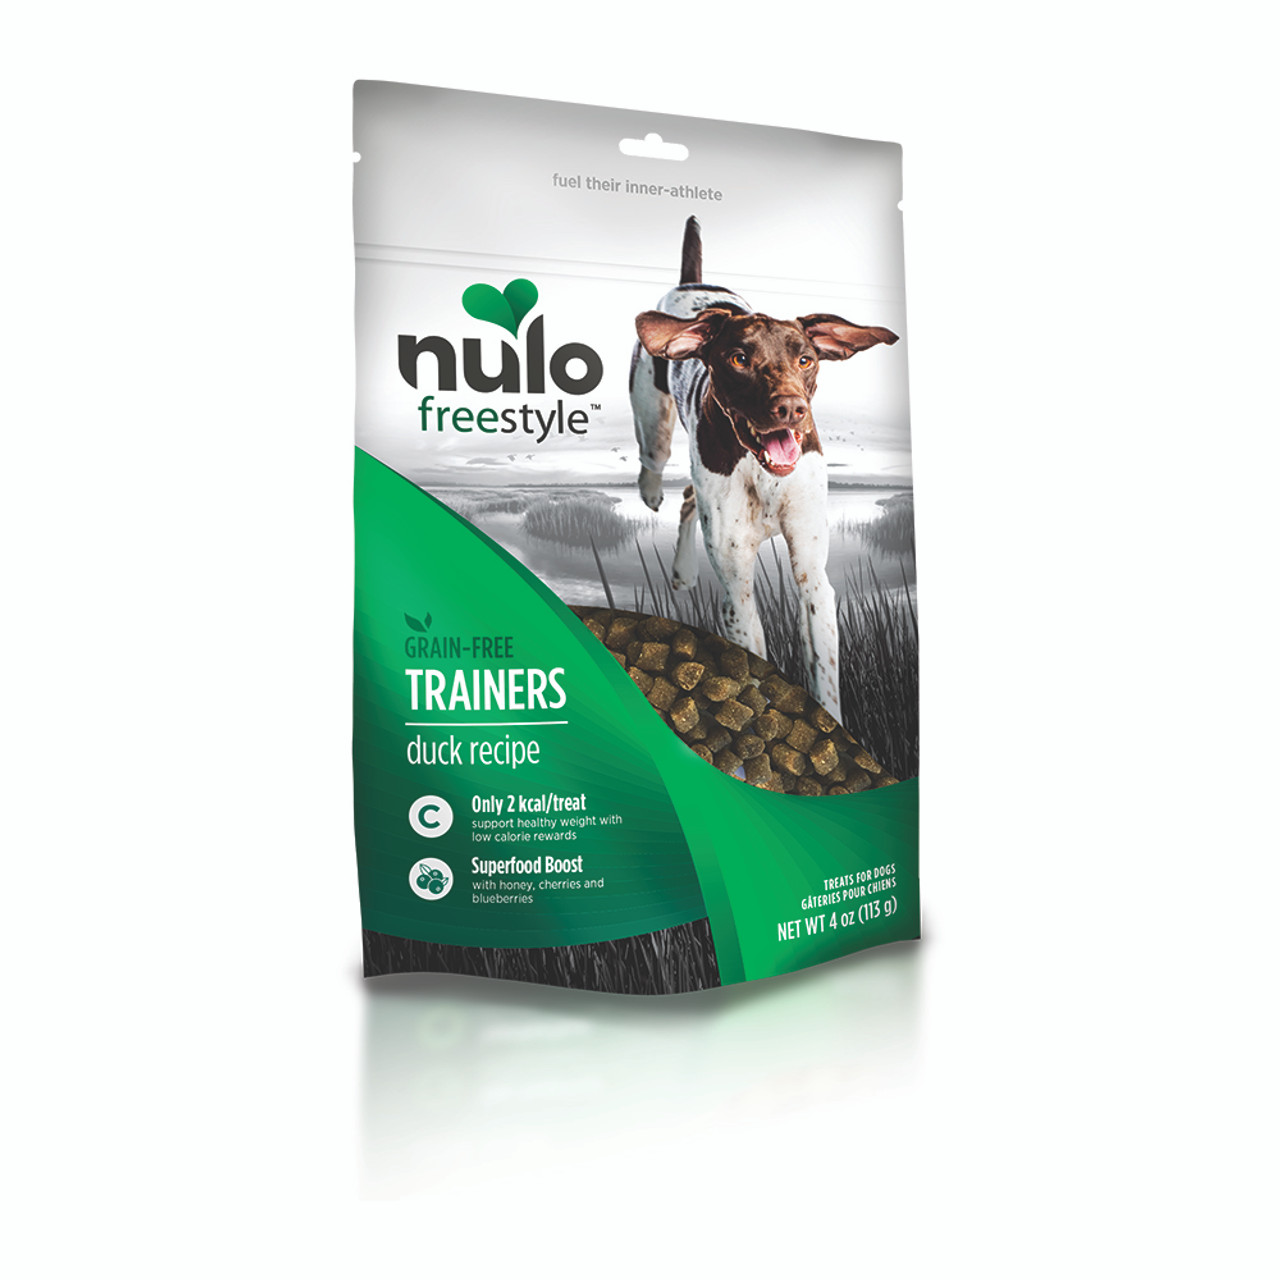 Nulo Freestyle Grain-Free Trainers Duck Recipe Dog Training Treats